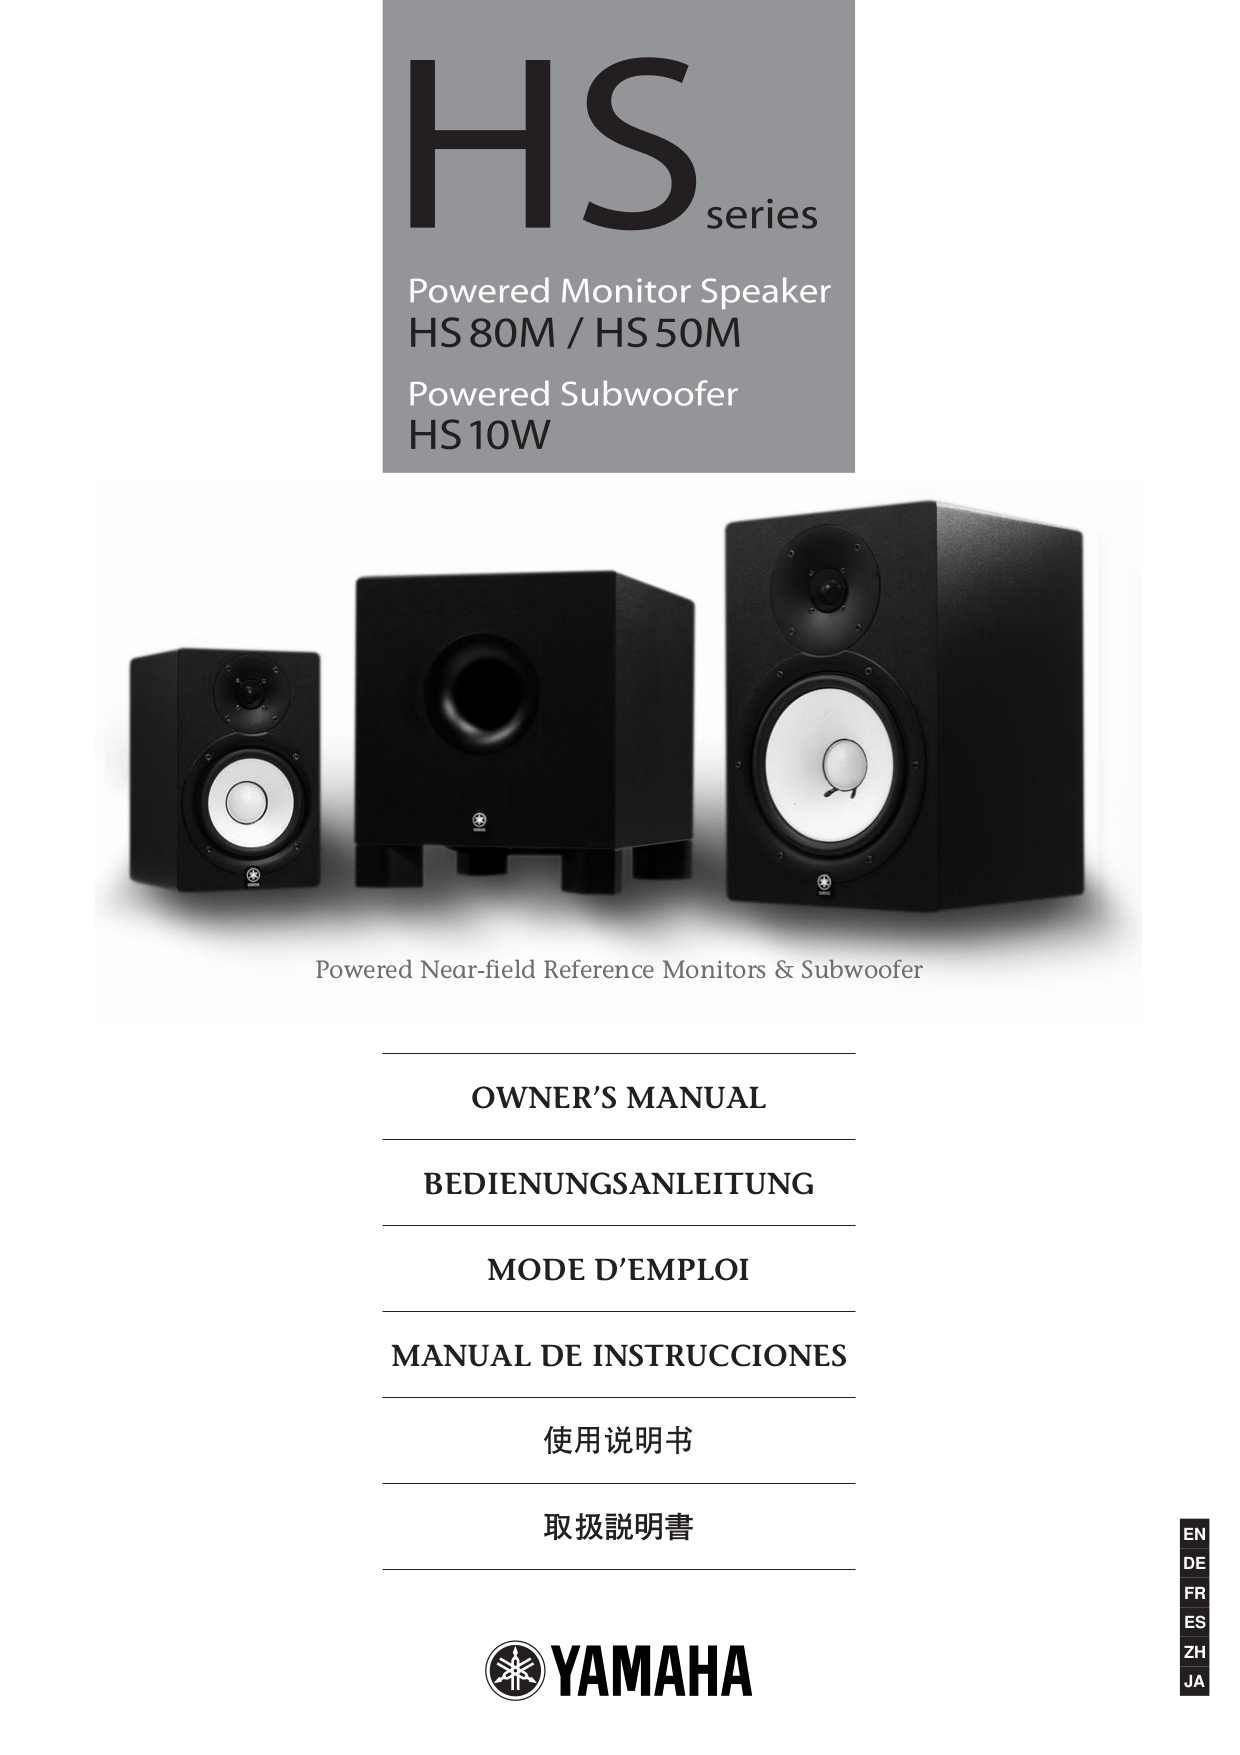 Yamaha Speaker Manuals Ricoh Color Copier Aficio Mp C2800 C3300 Service Manual Array Download Free Pdf For Hs50m Rh Umlib Com